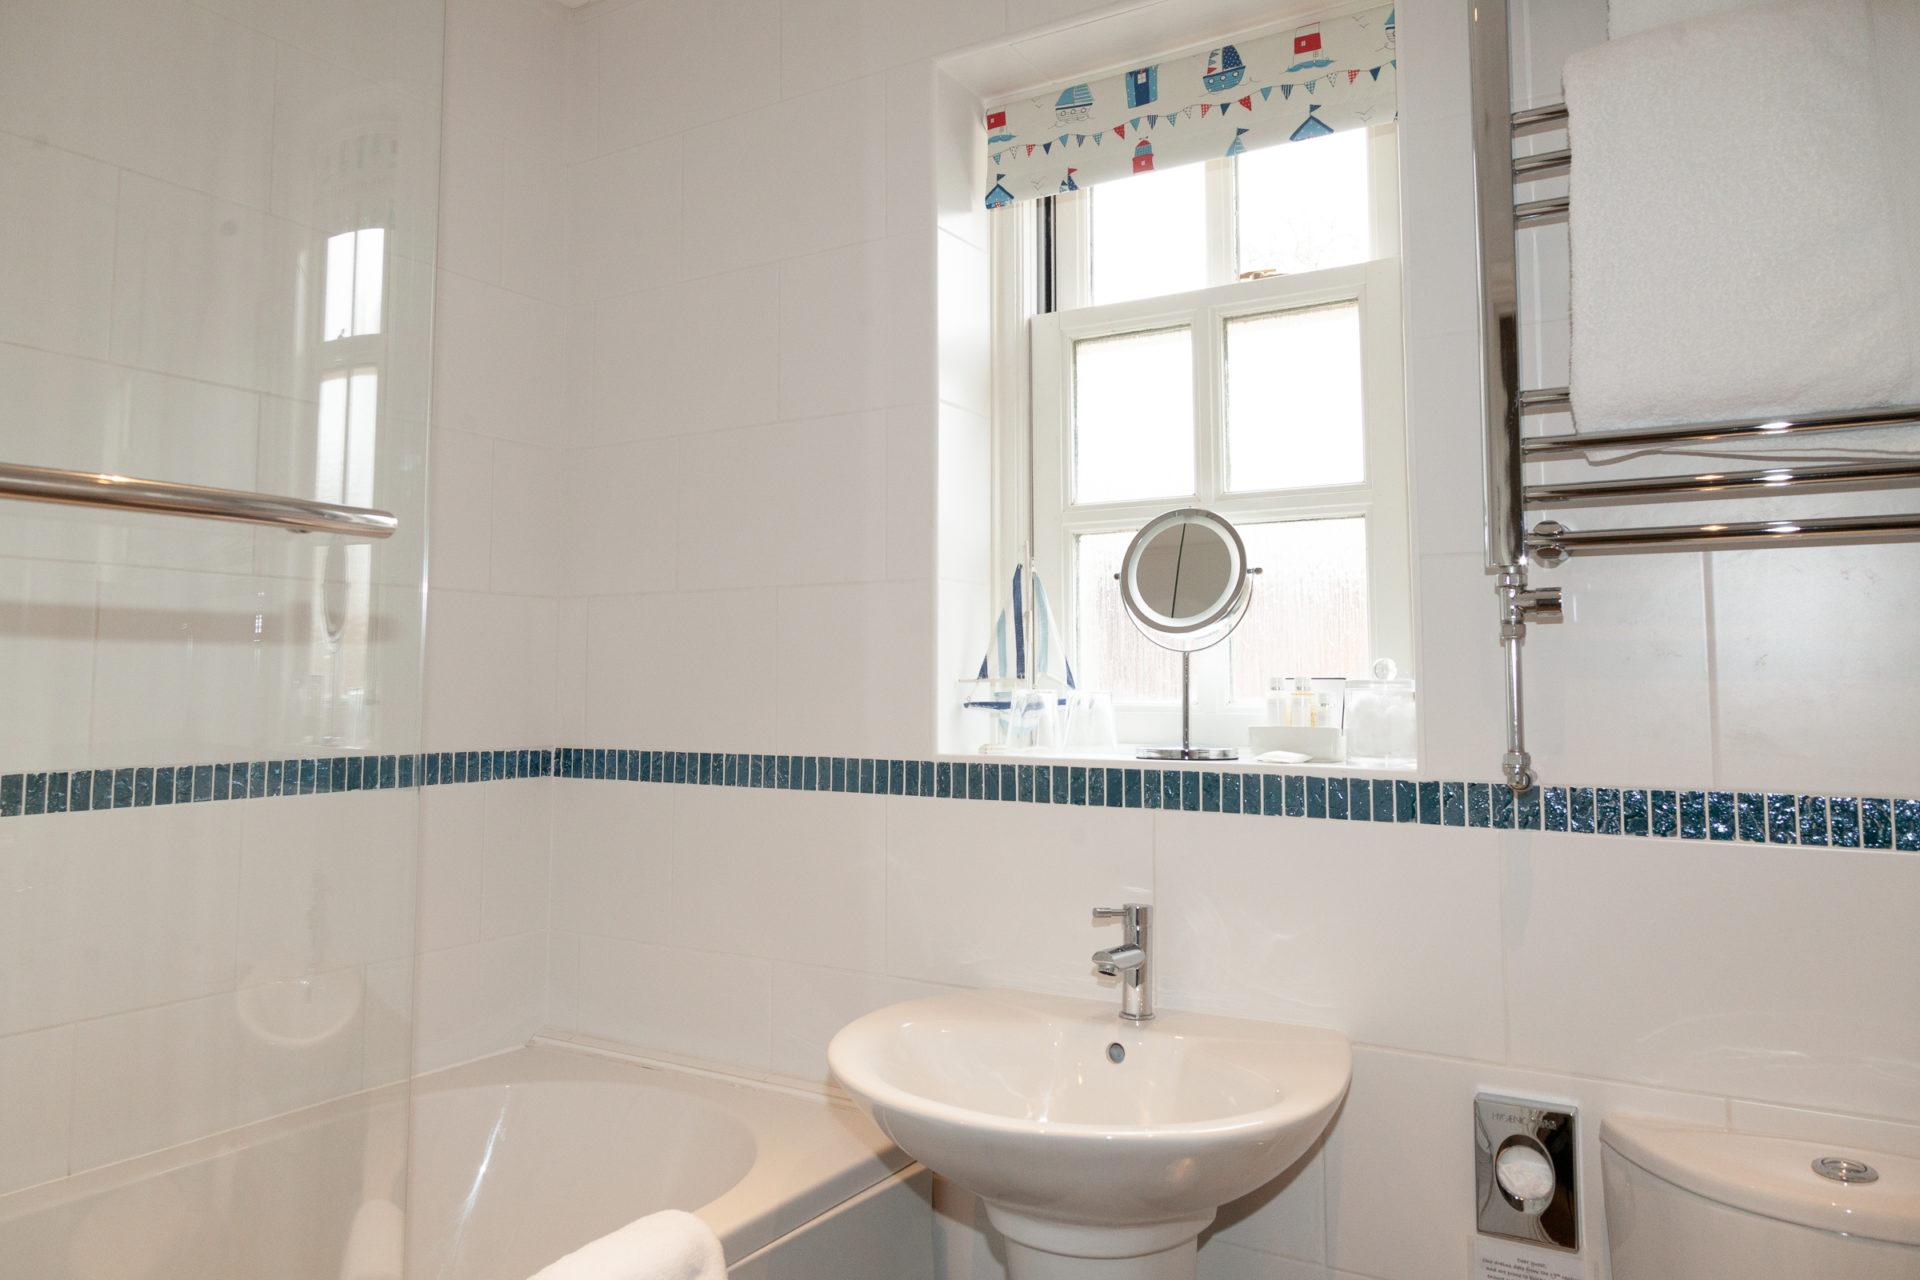 Bathroom at Mallock Cottage, Cockington, Torquay